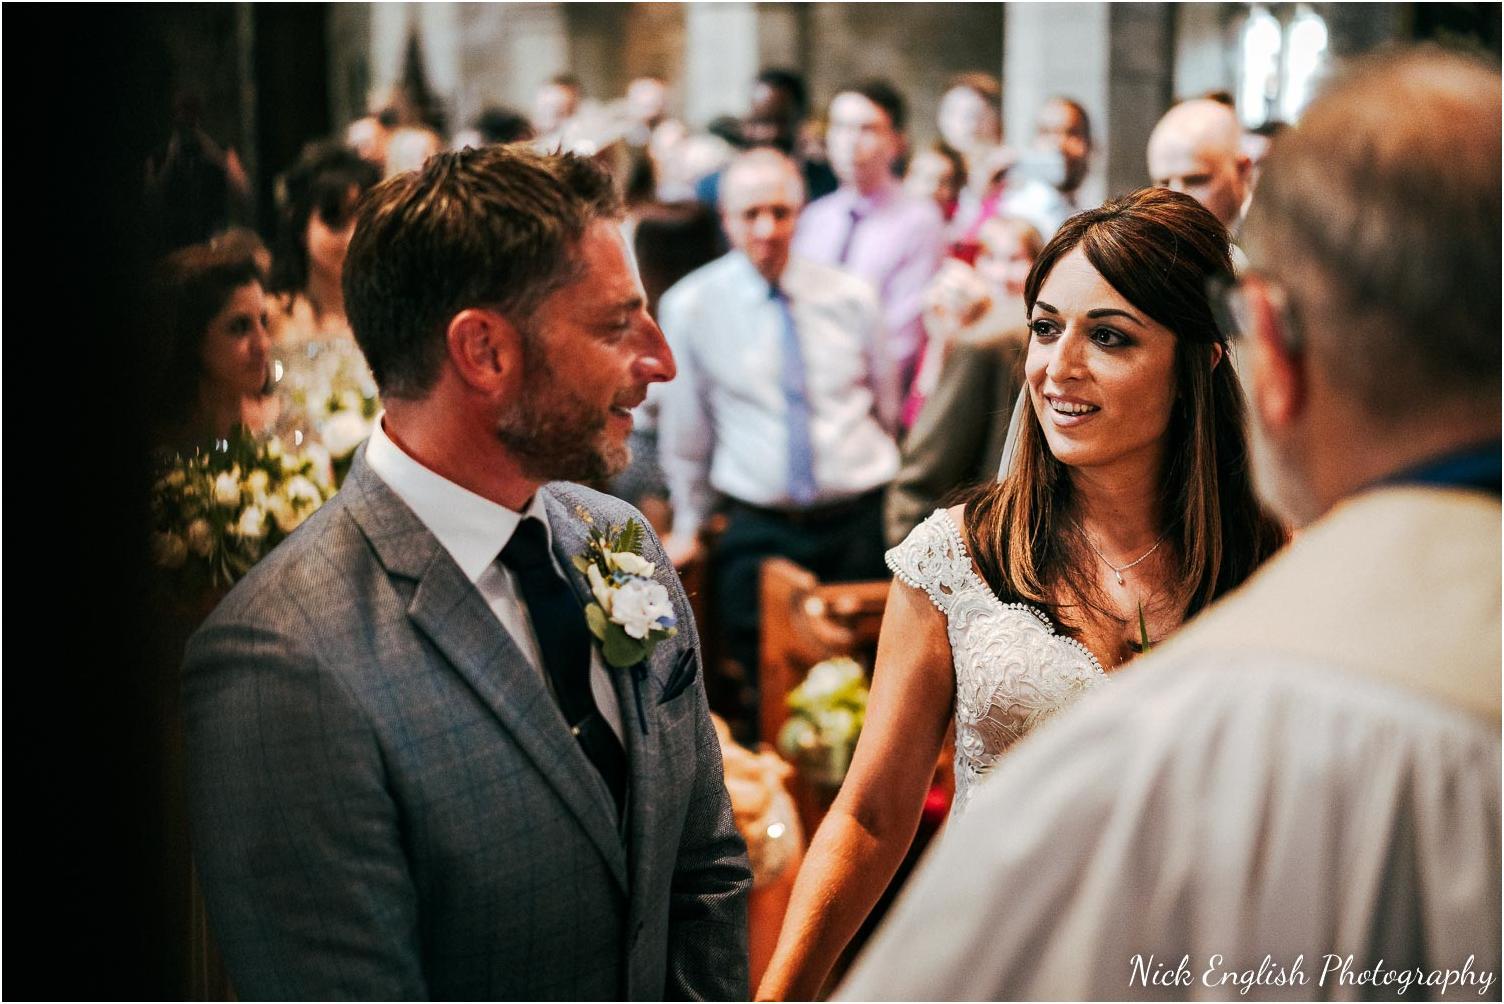 Mitton_Hall_Wedding_Photographer-34.jpg